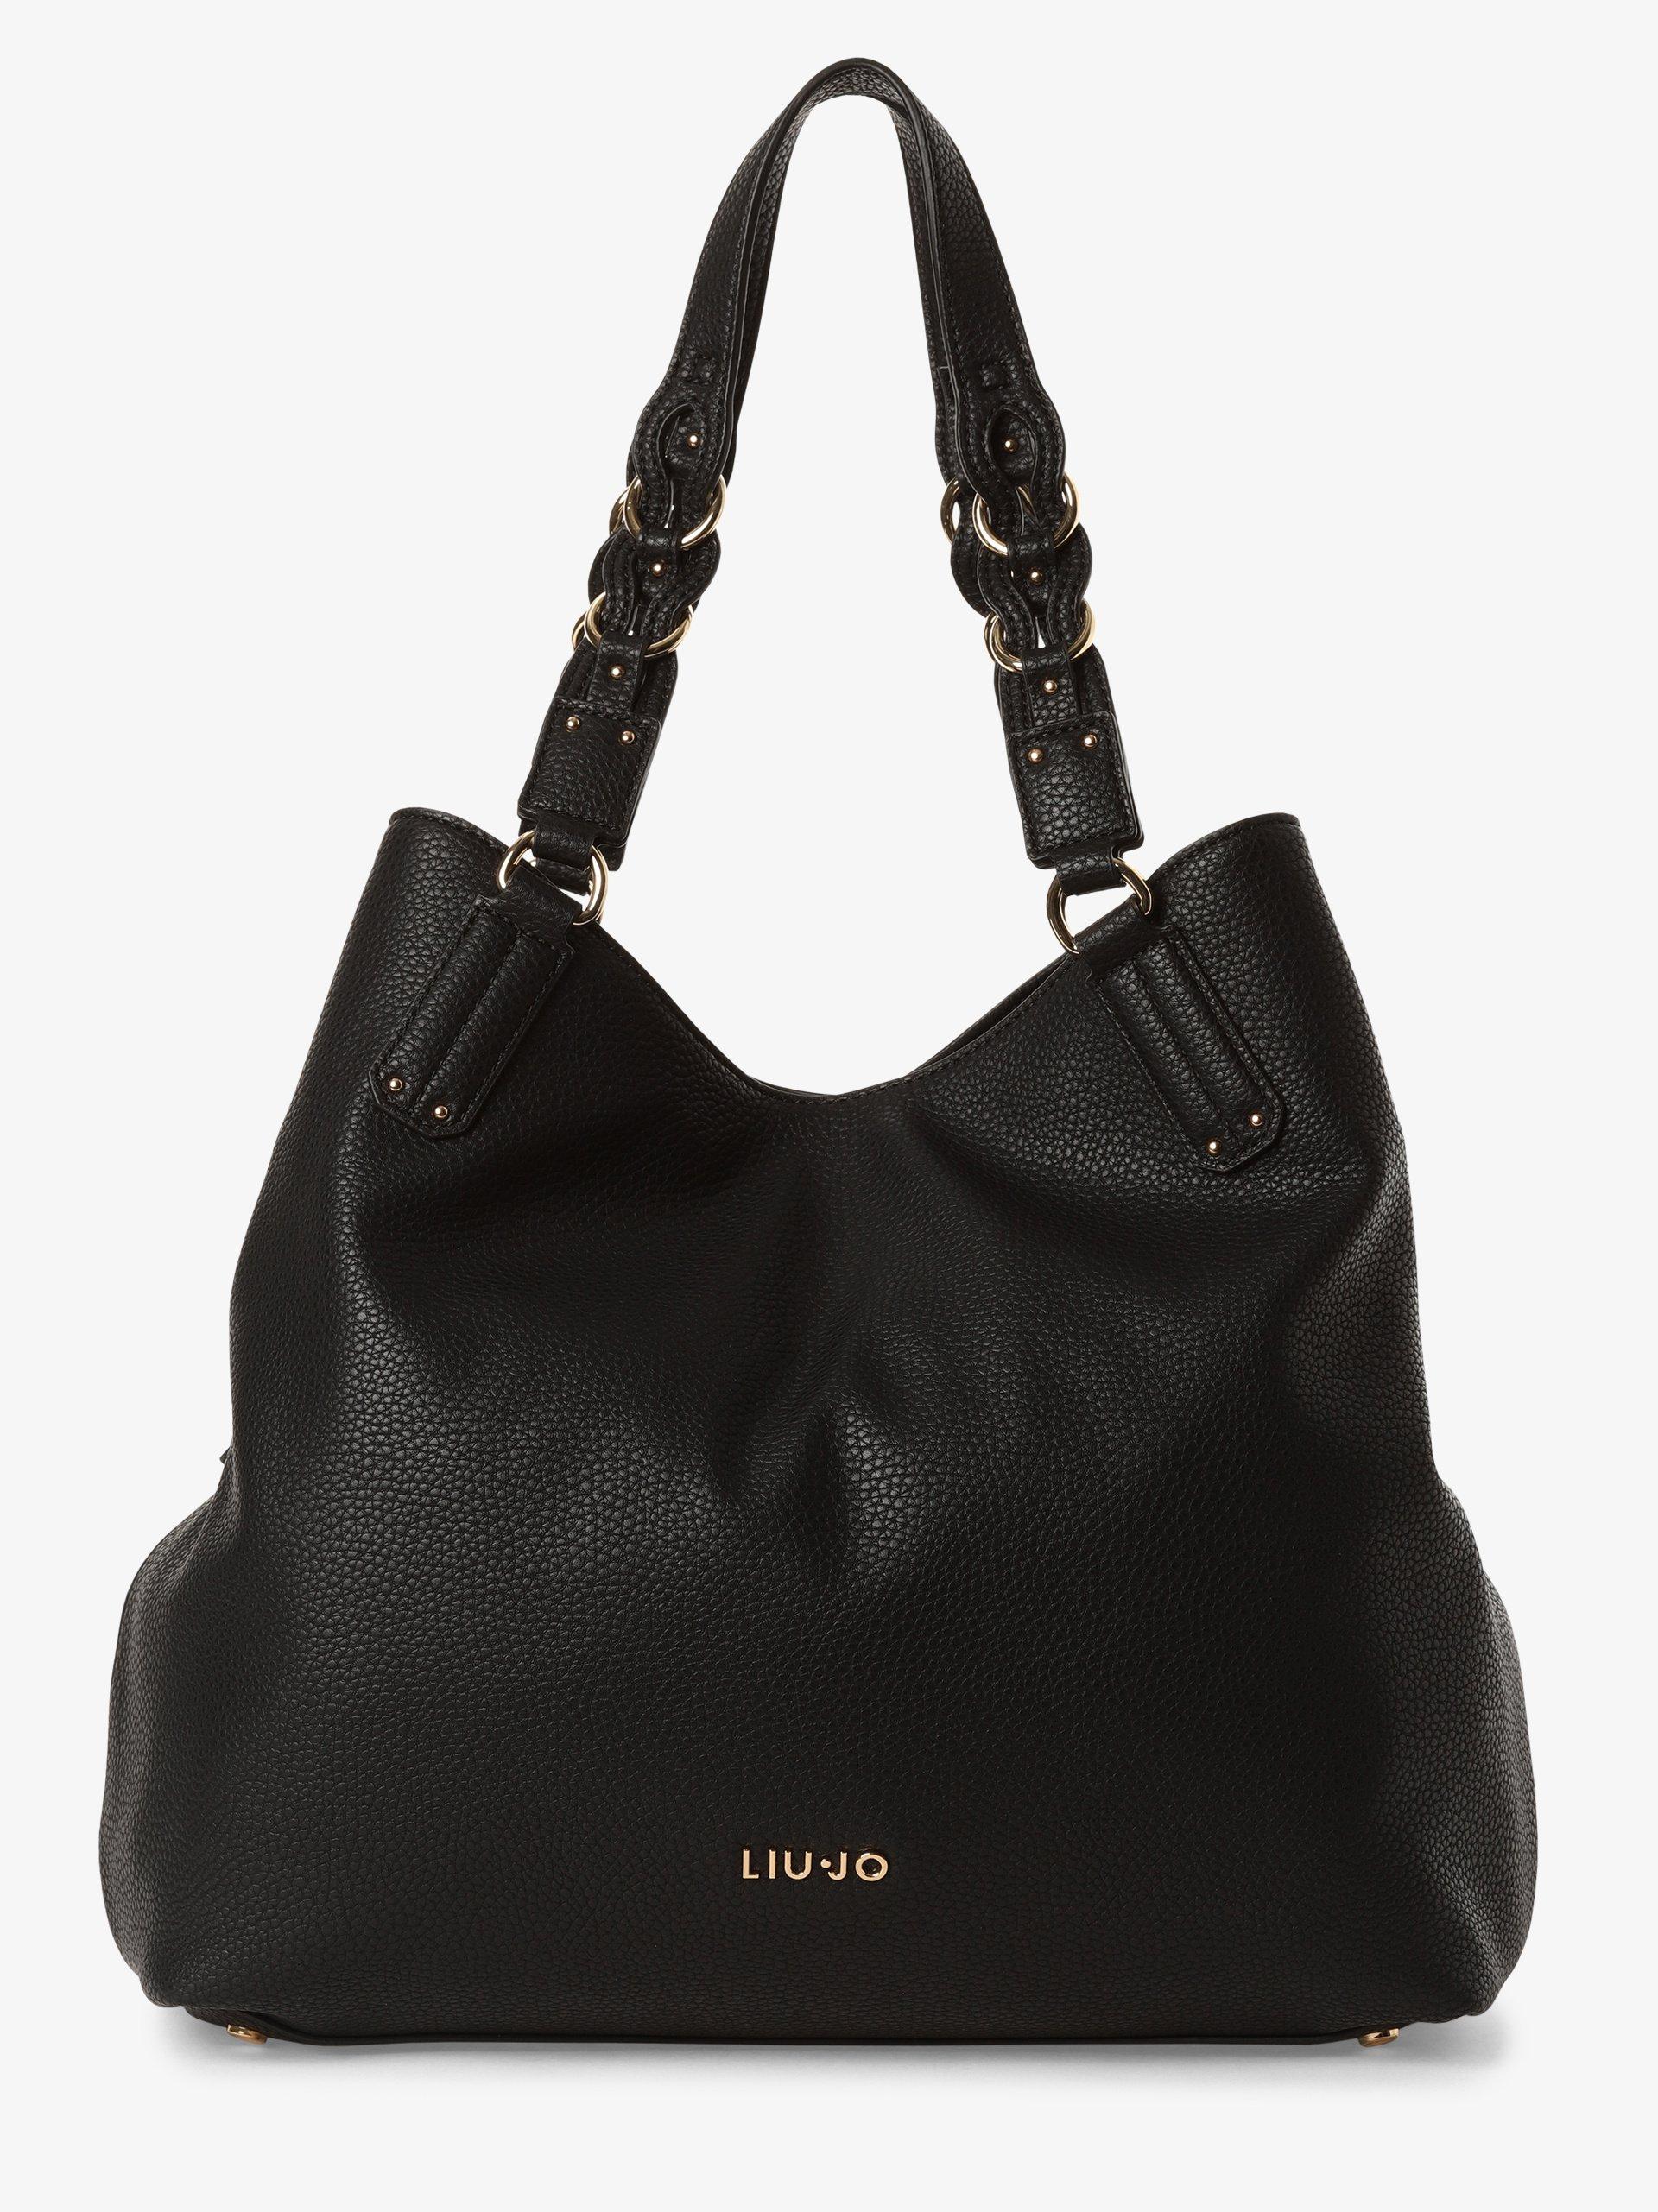 Liu Jo Collection Damen Shopper